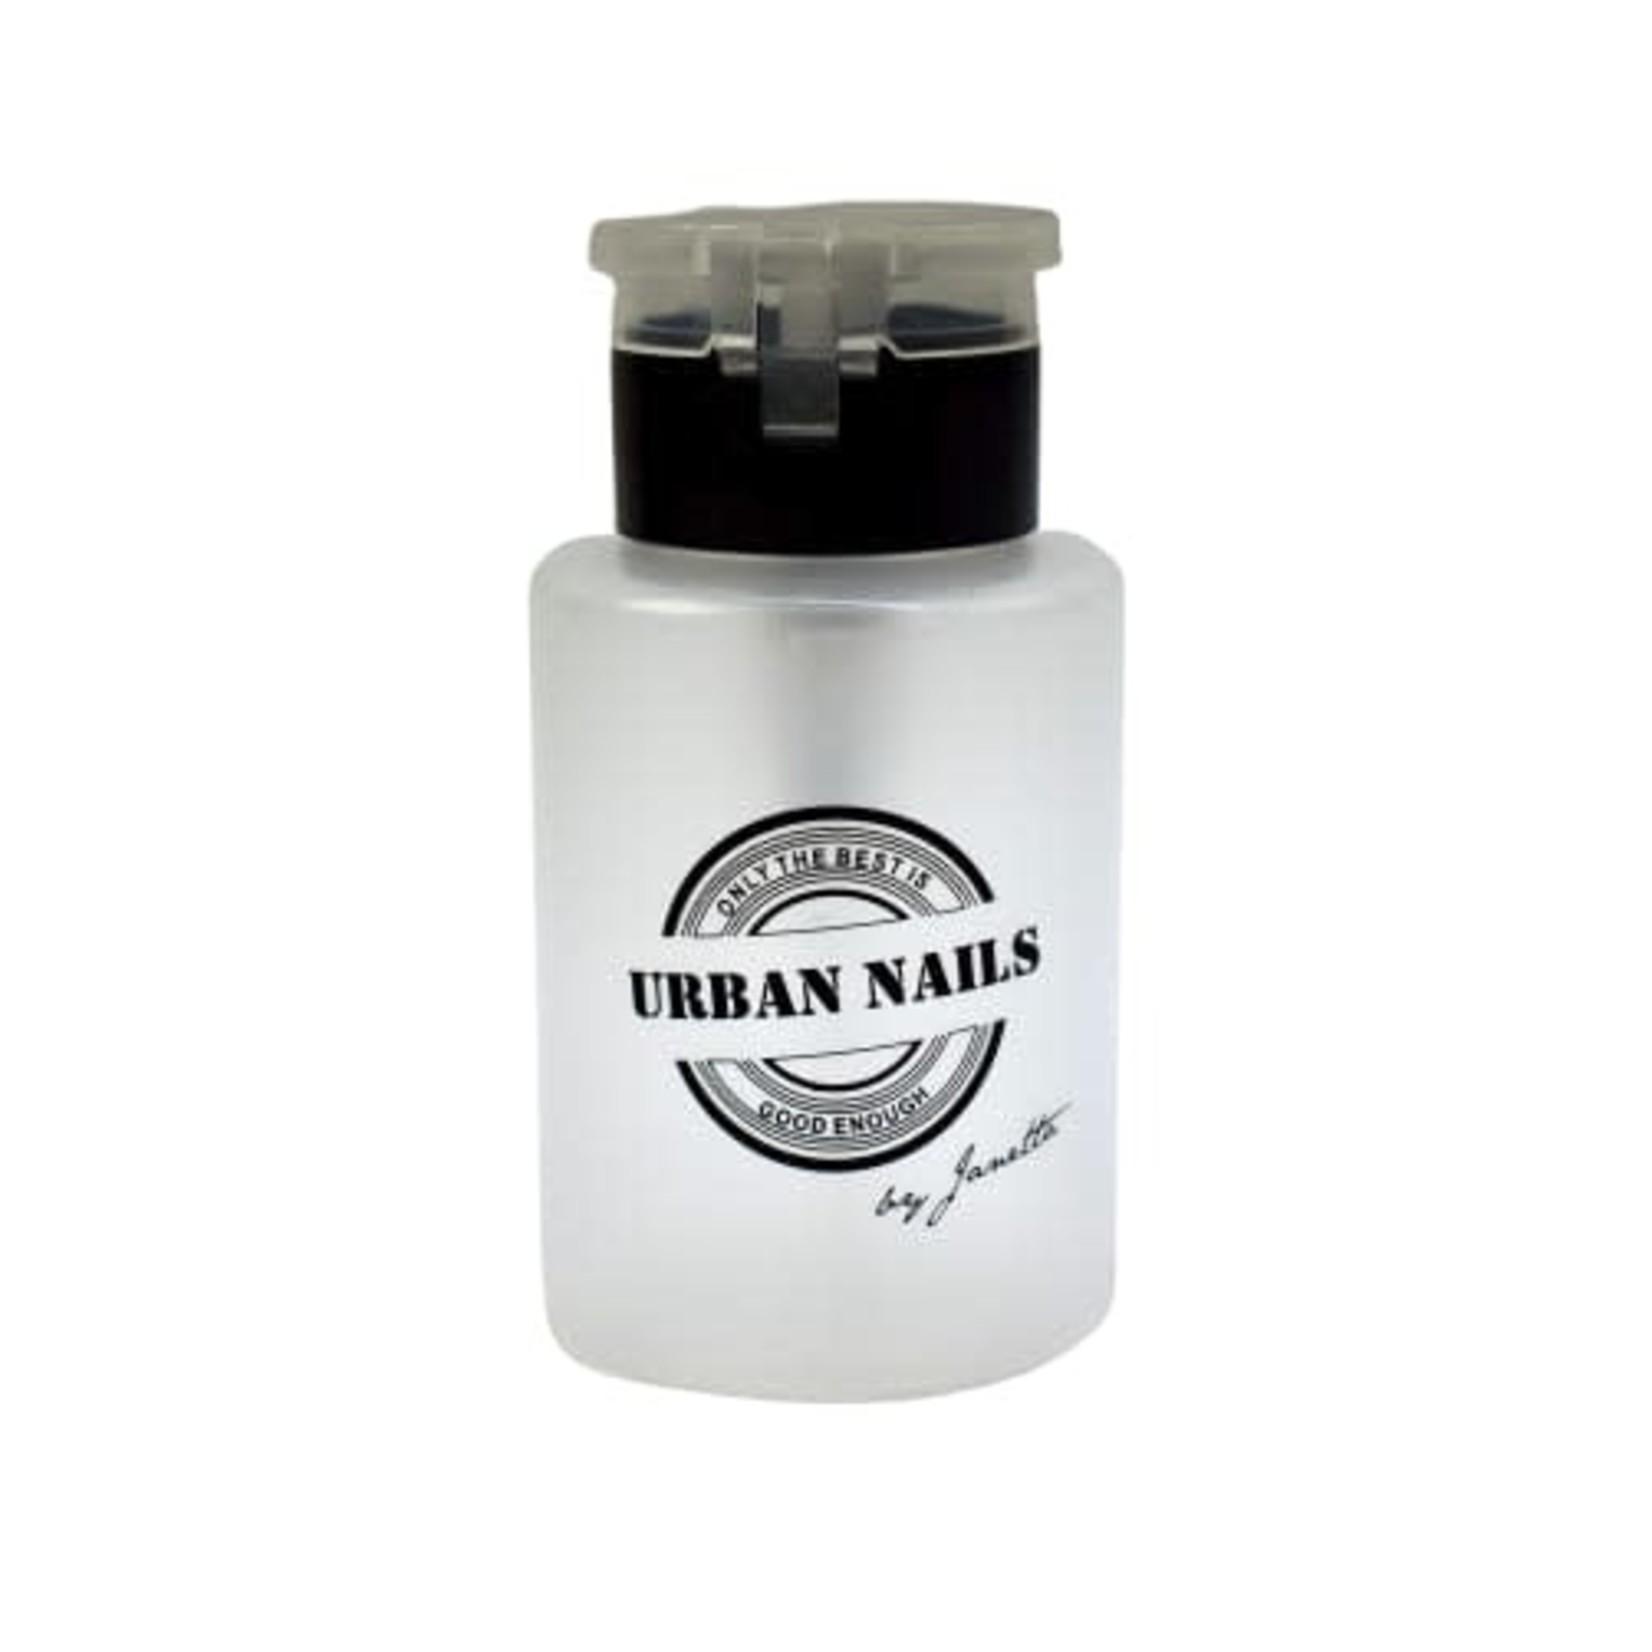 Urban Nails Pompfles Urban Nails